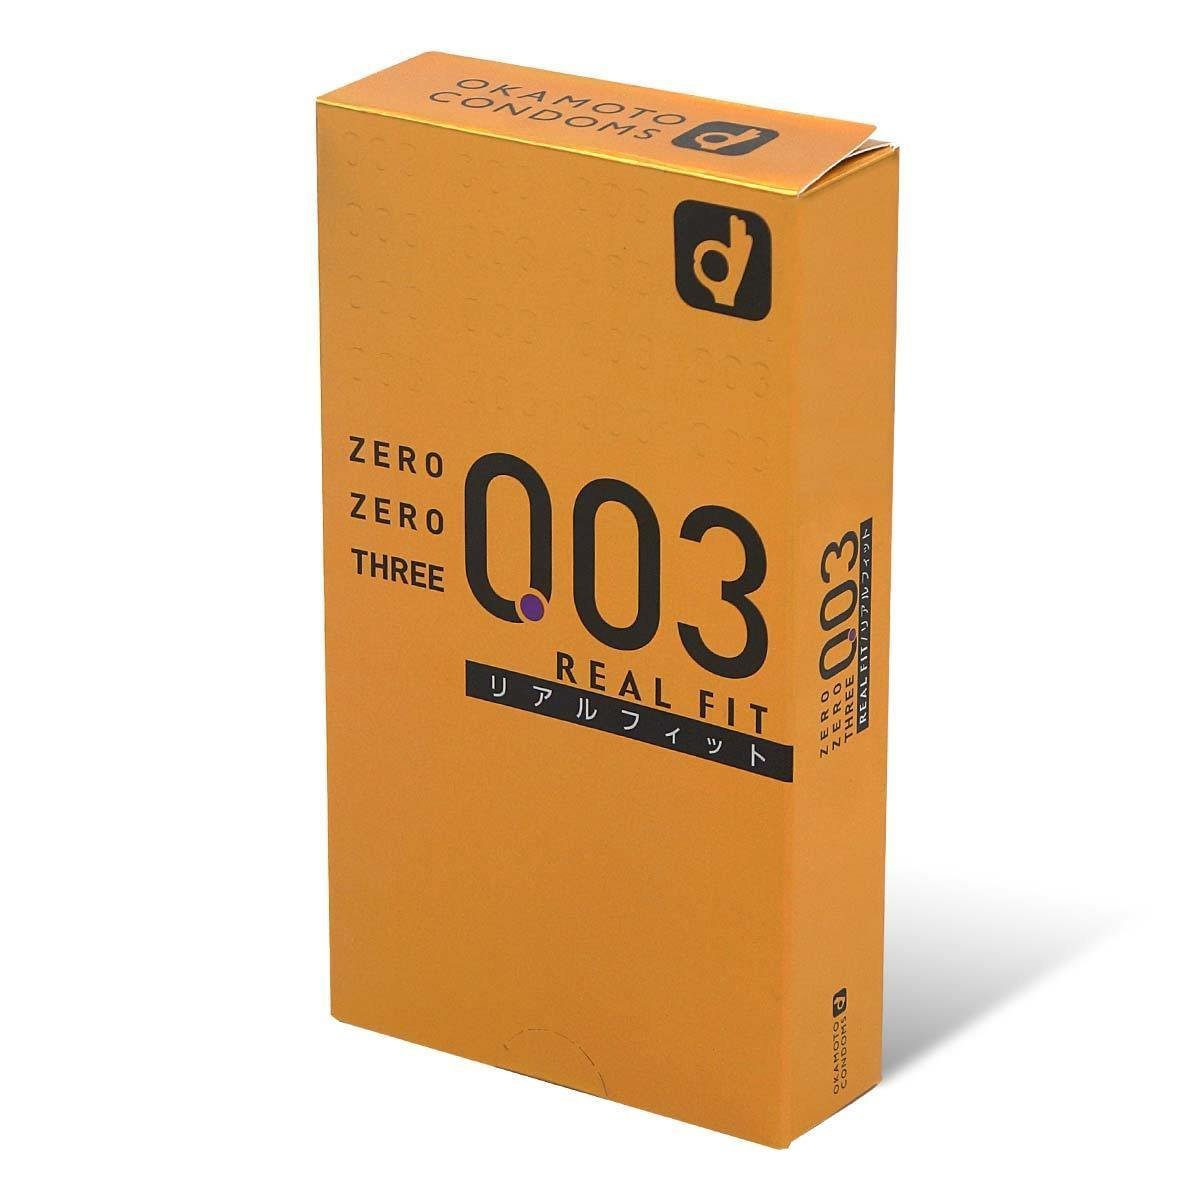 0.03 Real Fit condom 10 pcs  (Japan Version)